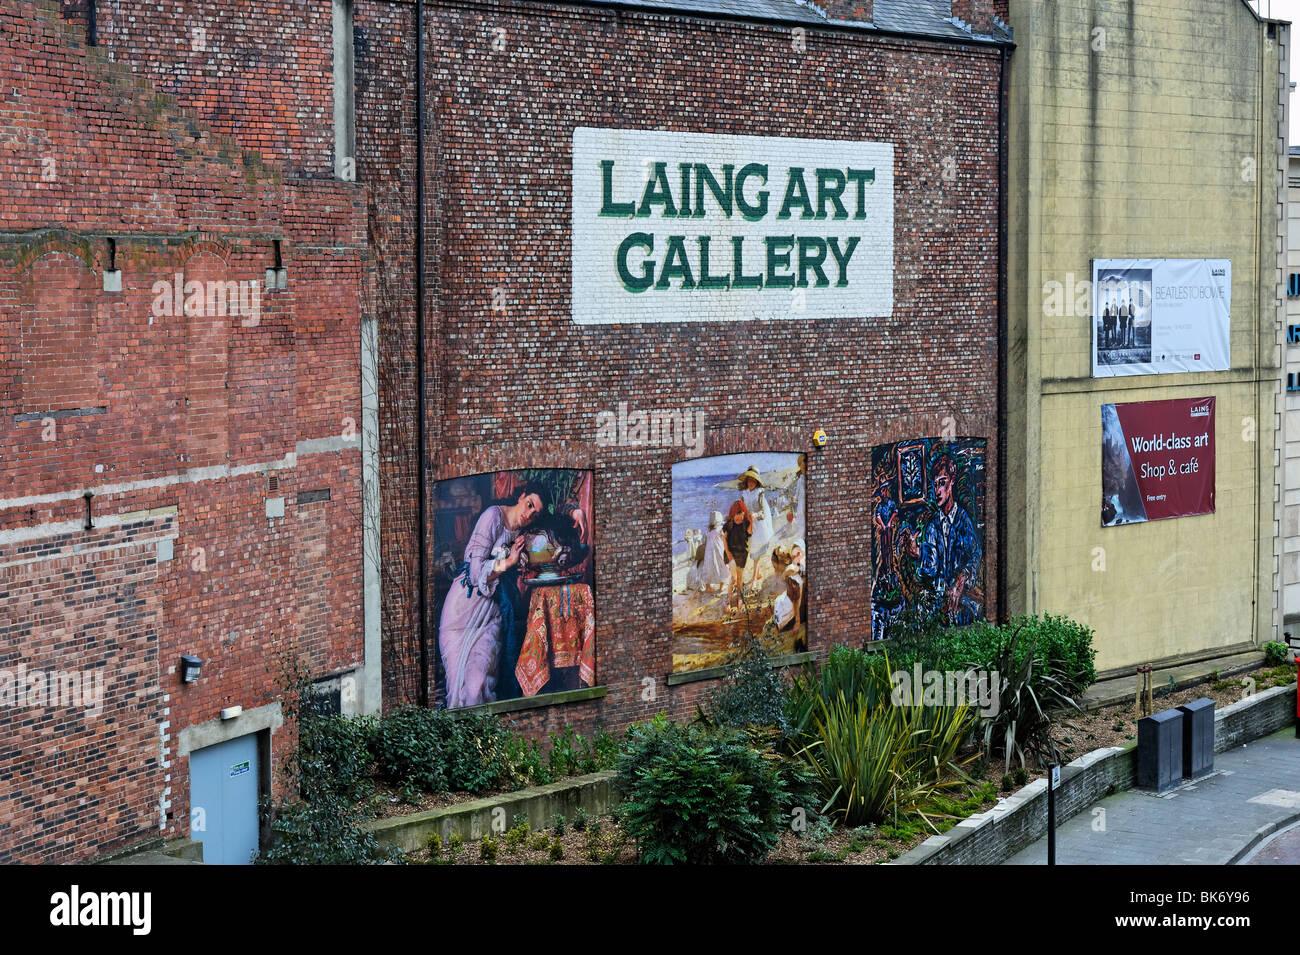 Laing Art Gallery Newcastle-upon-Tyne Stock Photo